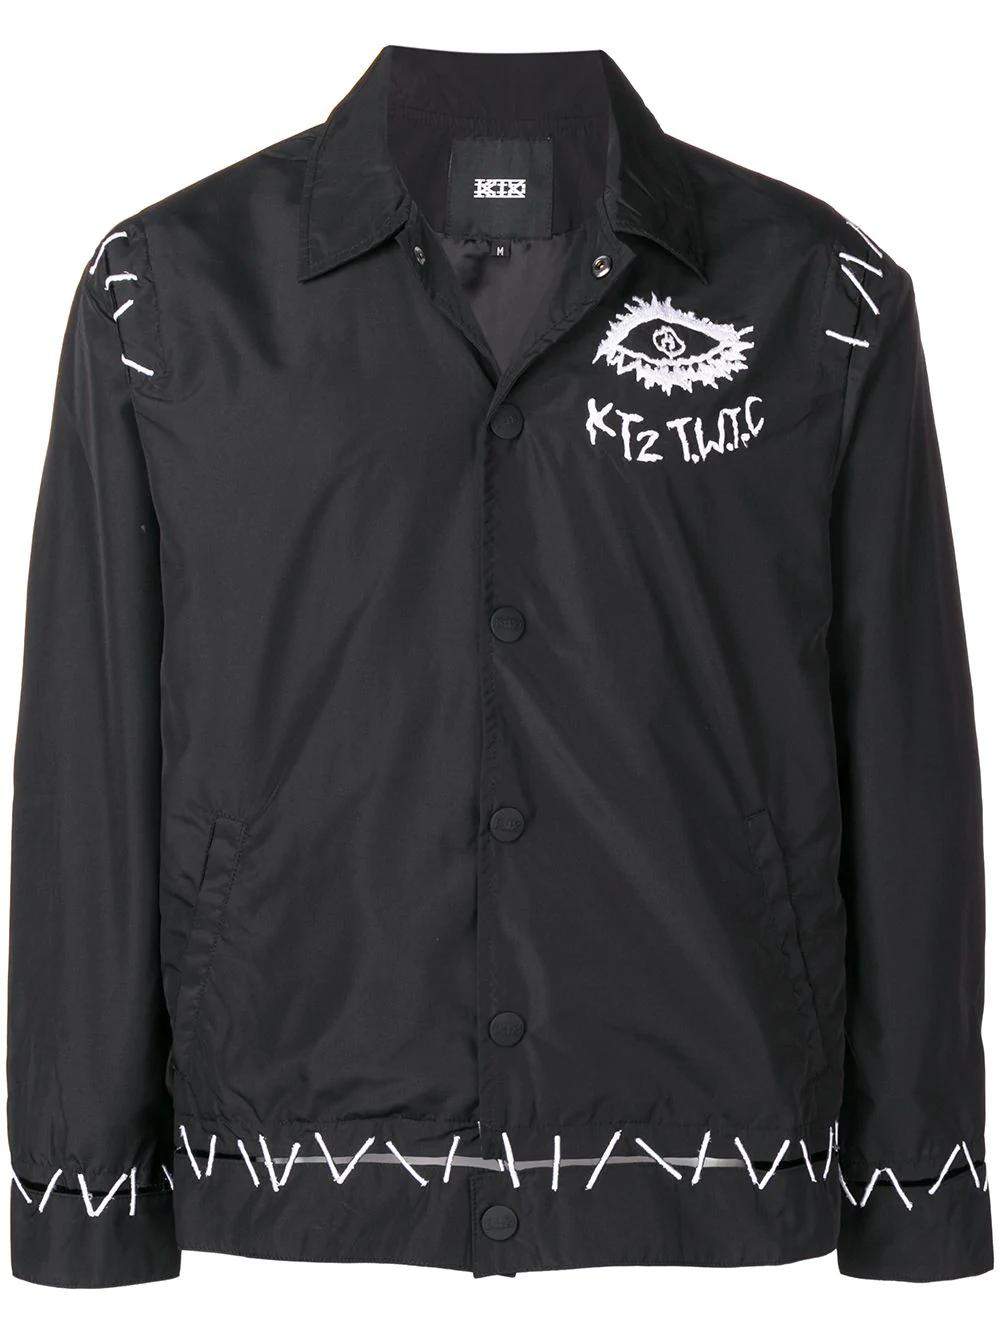 Ktz Pin Embroidered Coach Jacket - Black